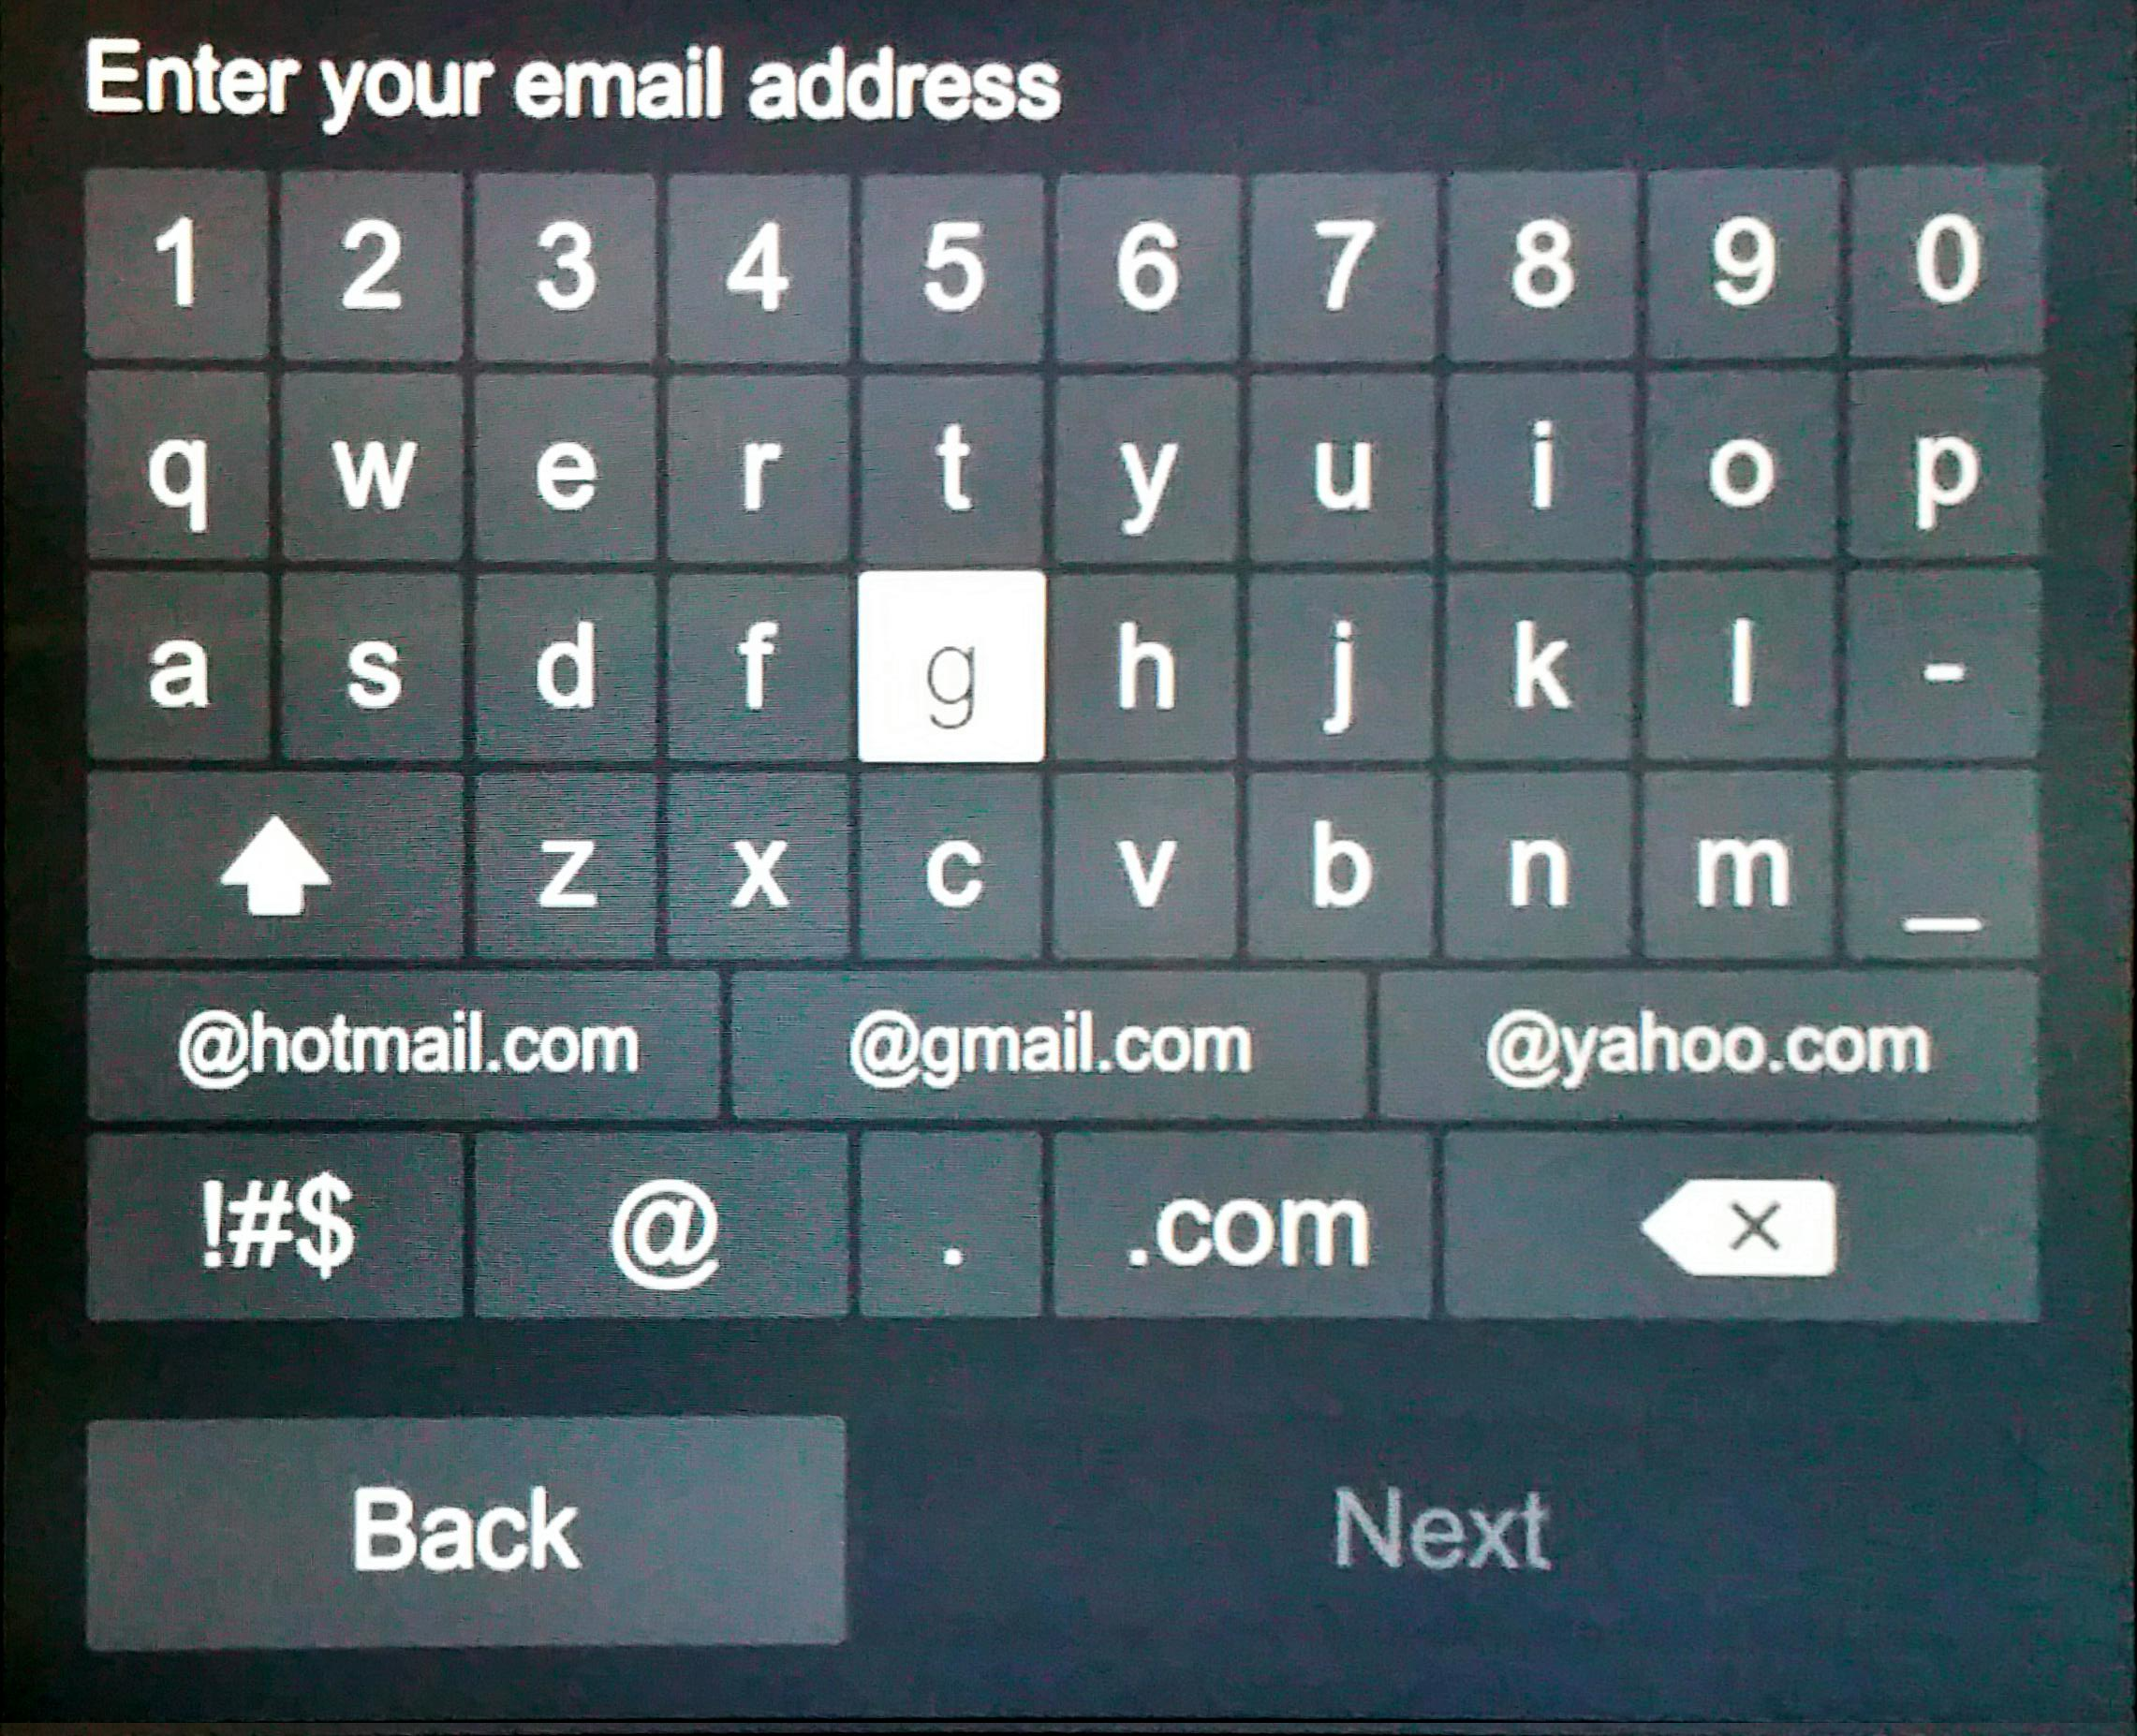 Netflix Keyboard